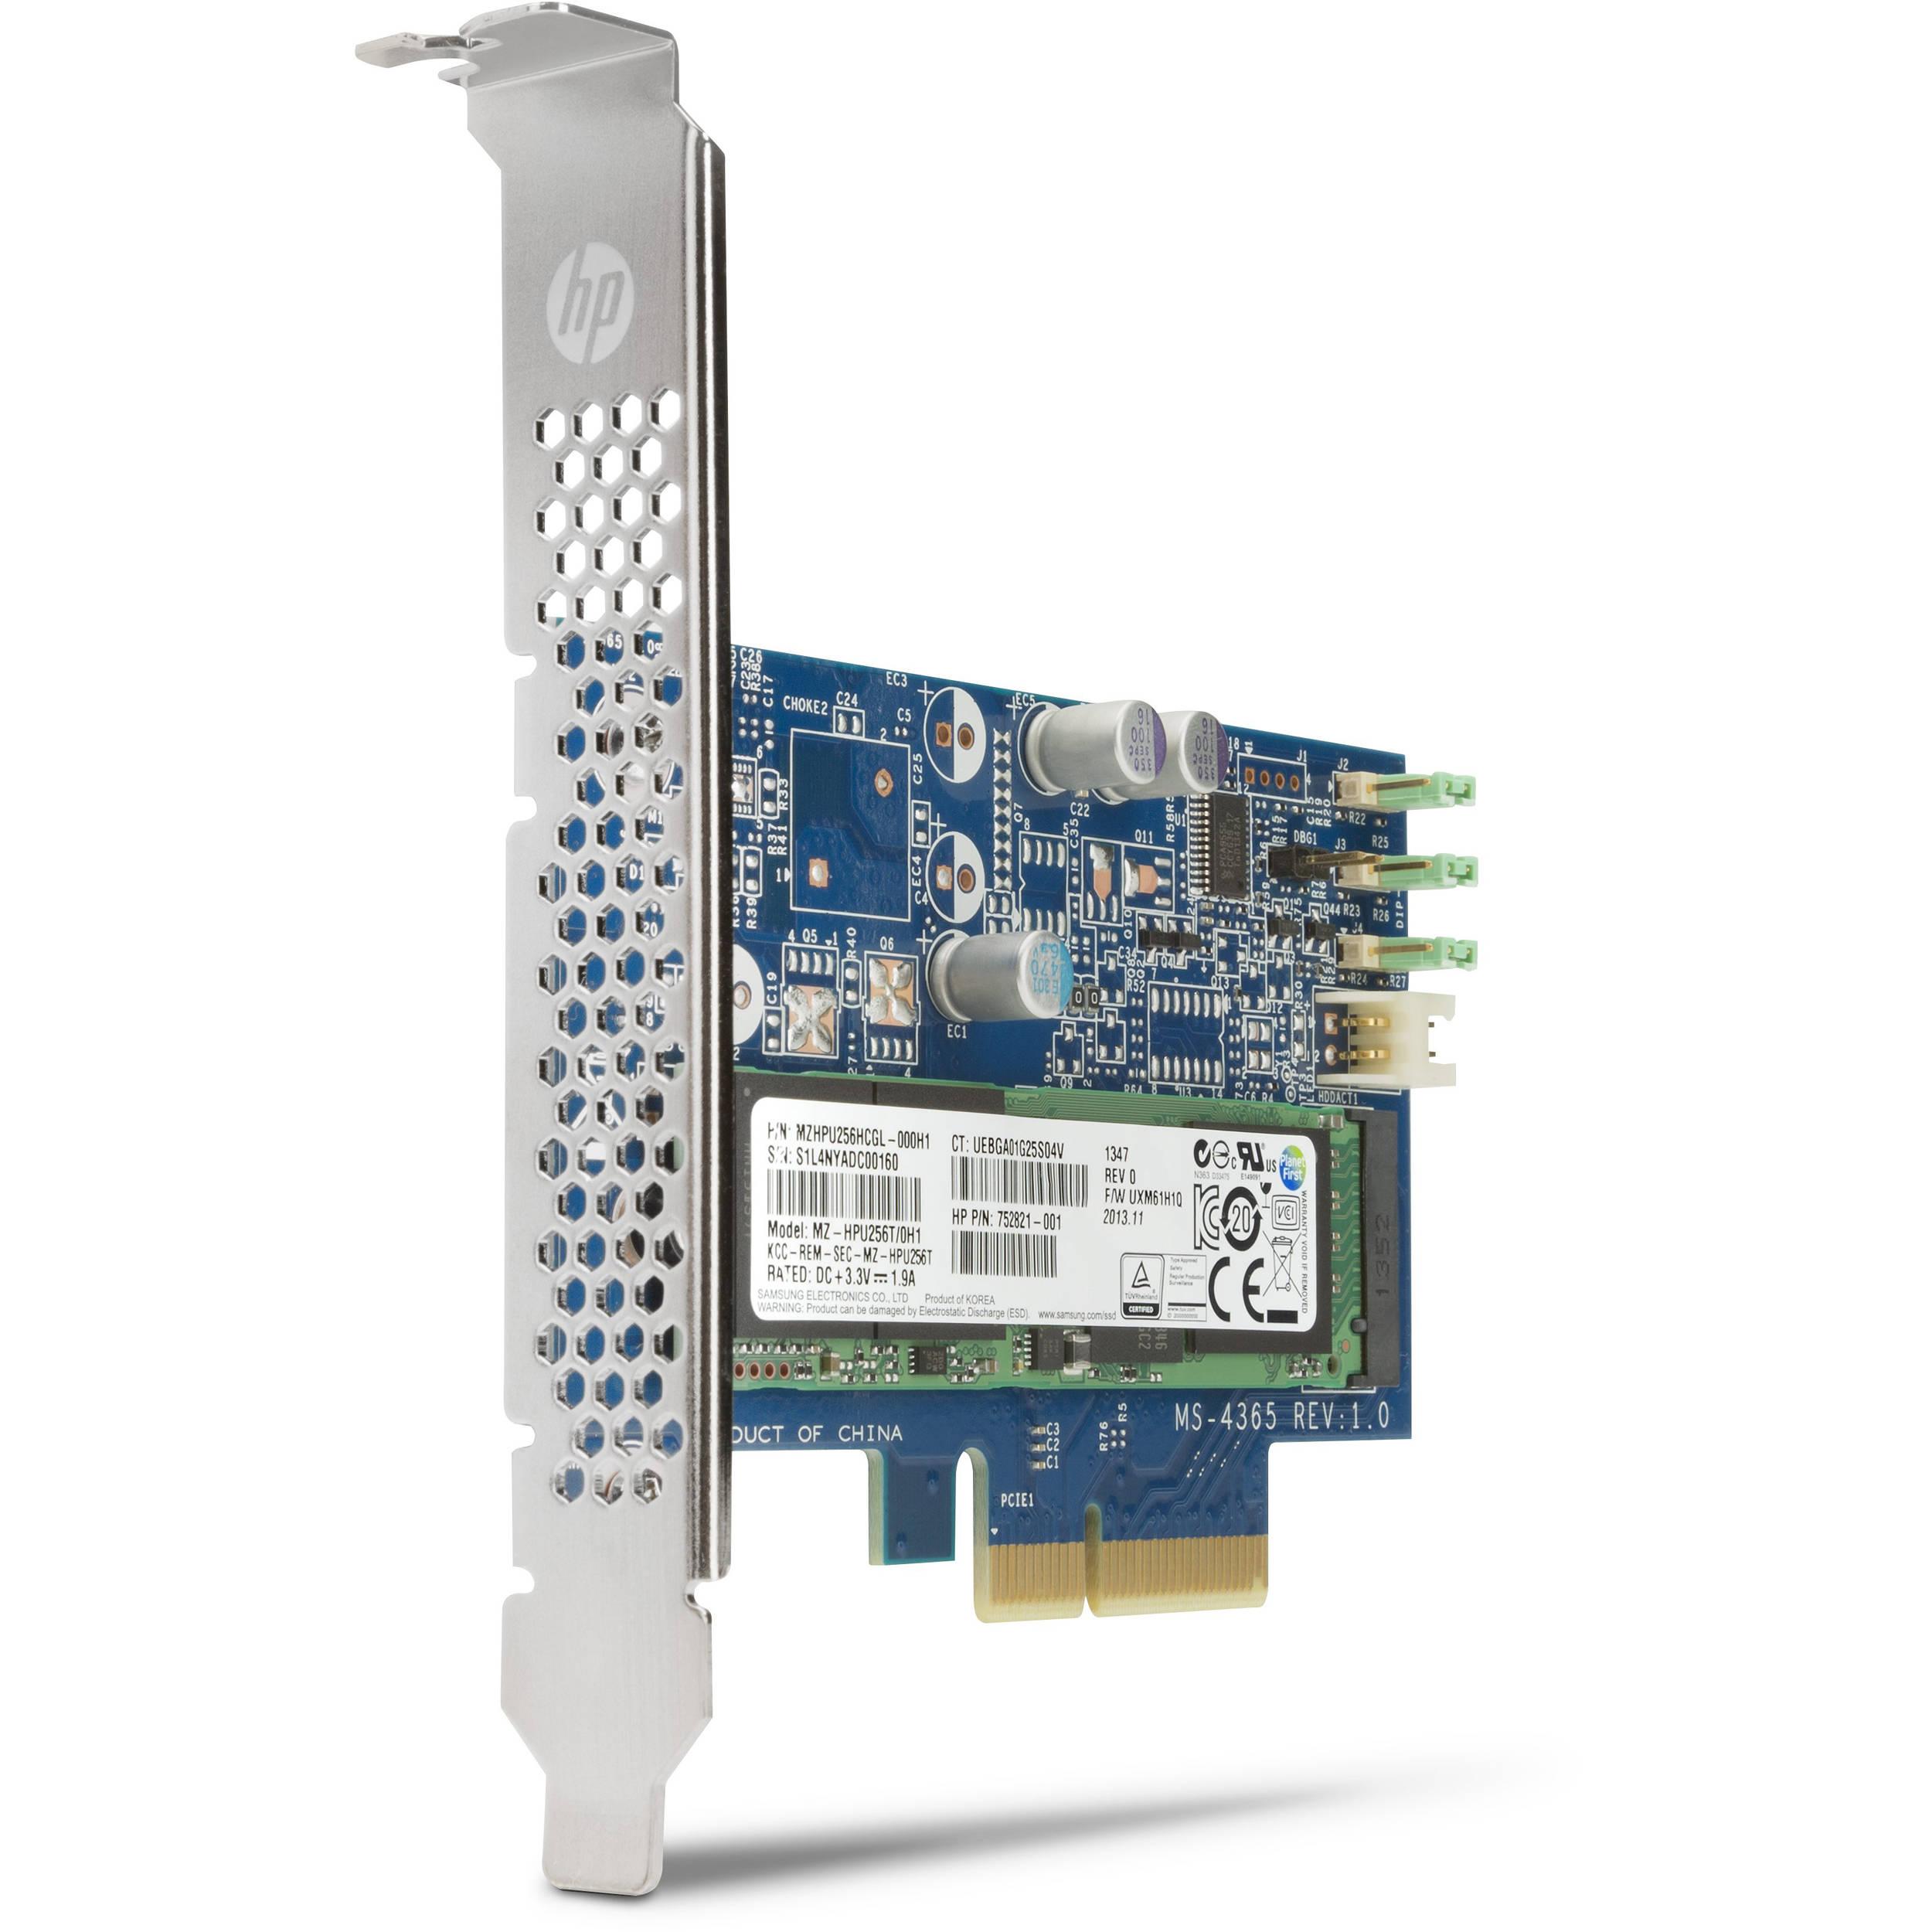 HP 256GB Z Turbo Drive G1 M.2 PCIe Internal SSD N8T11AT B&H